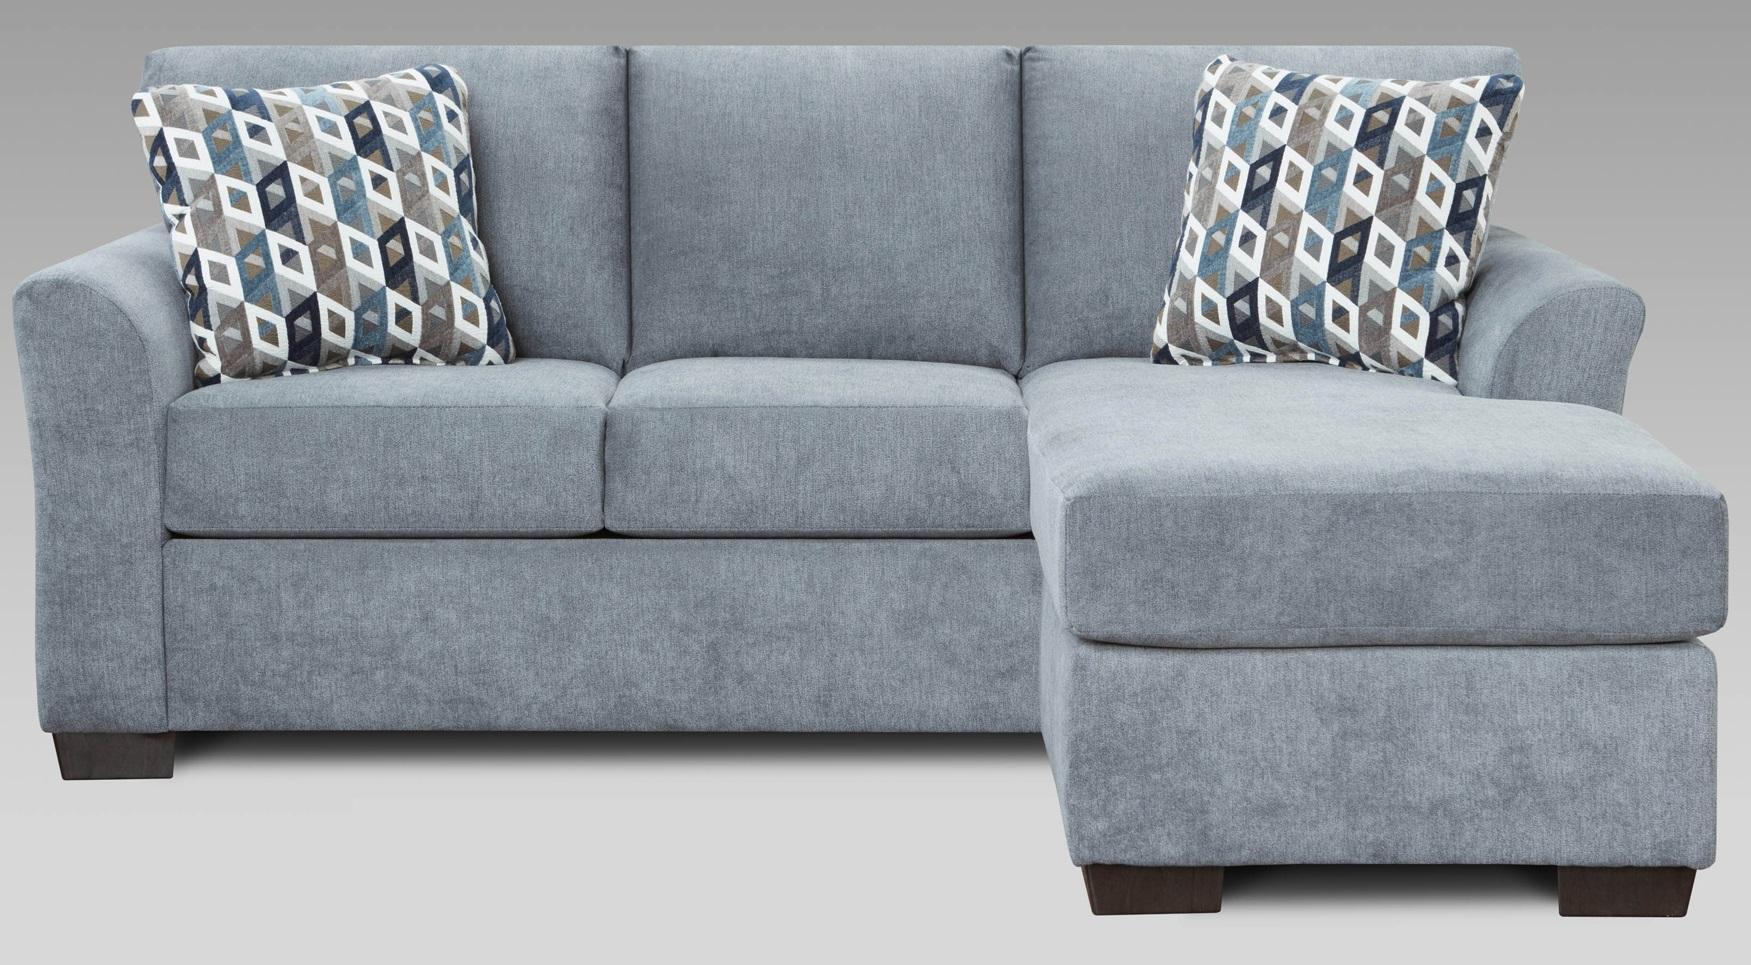 Sofas | Colder\'s Furniture Appliances and Mattresses